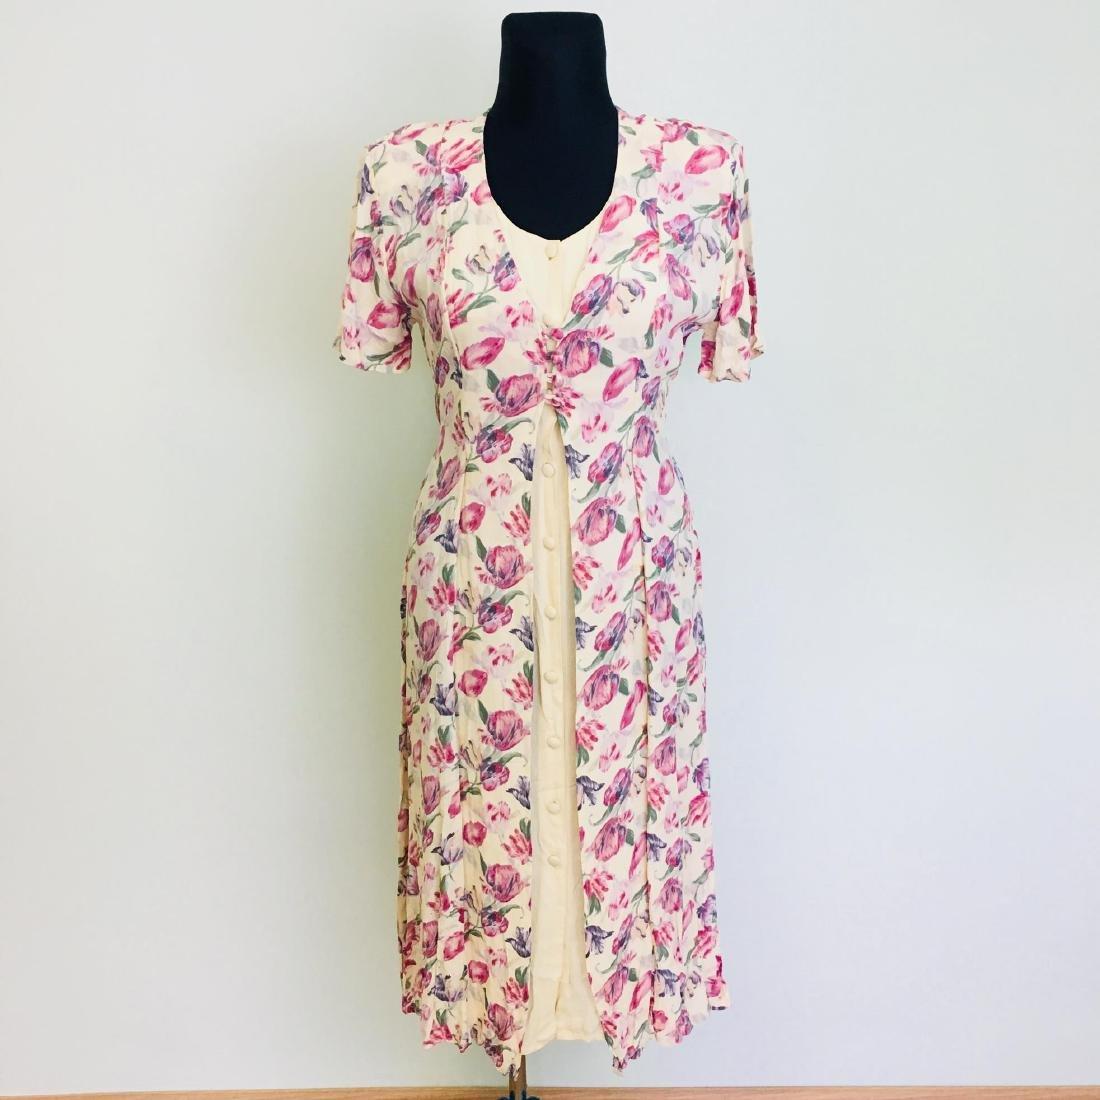 Vintage Women's Day Coctail Dress